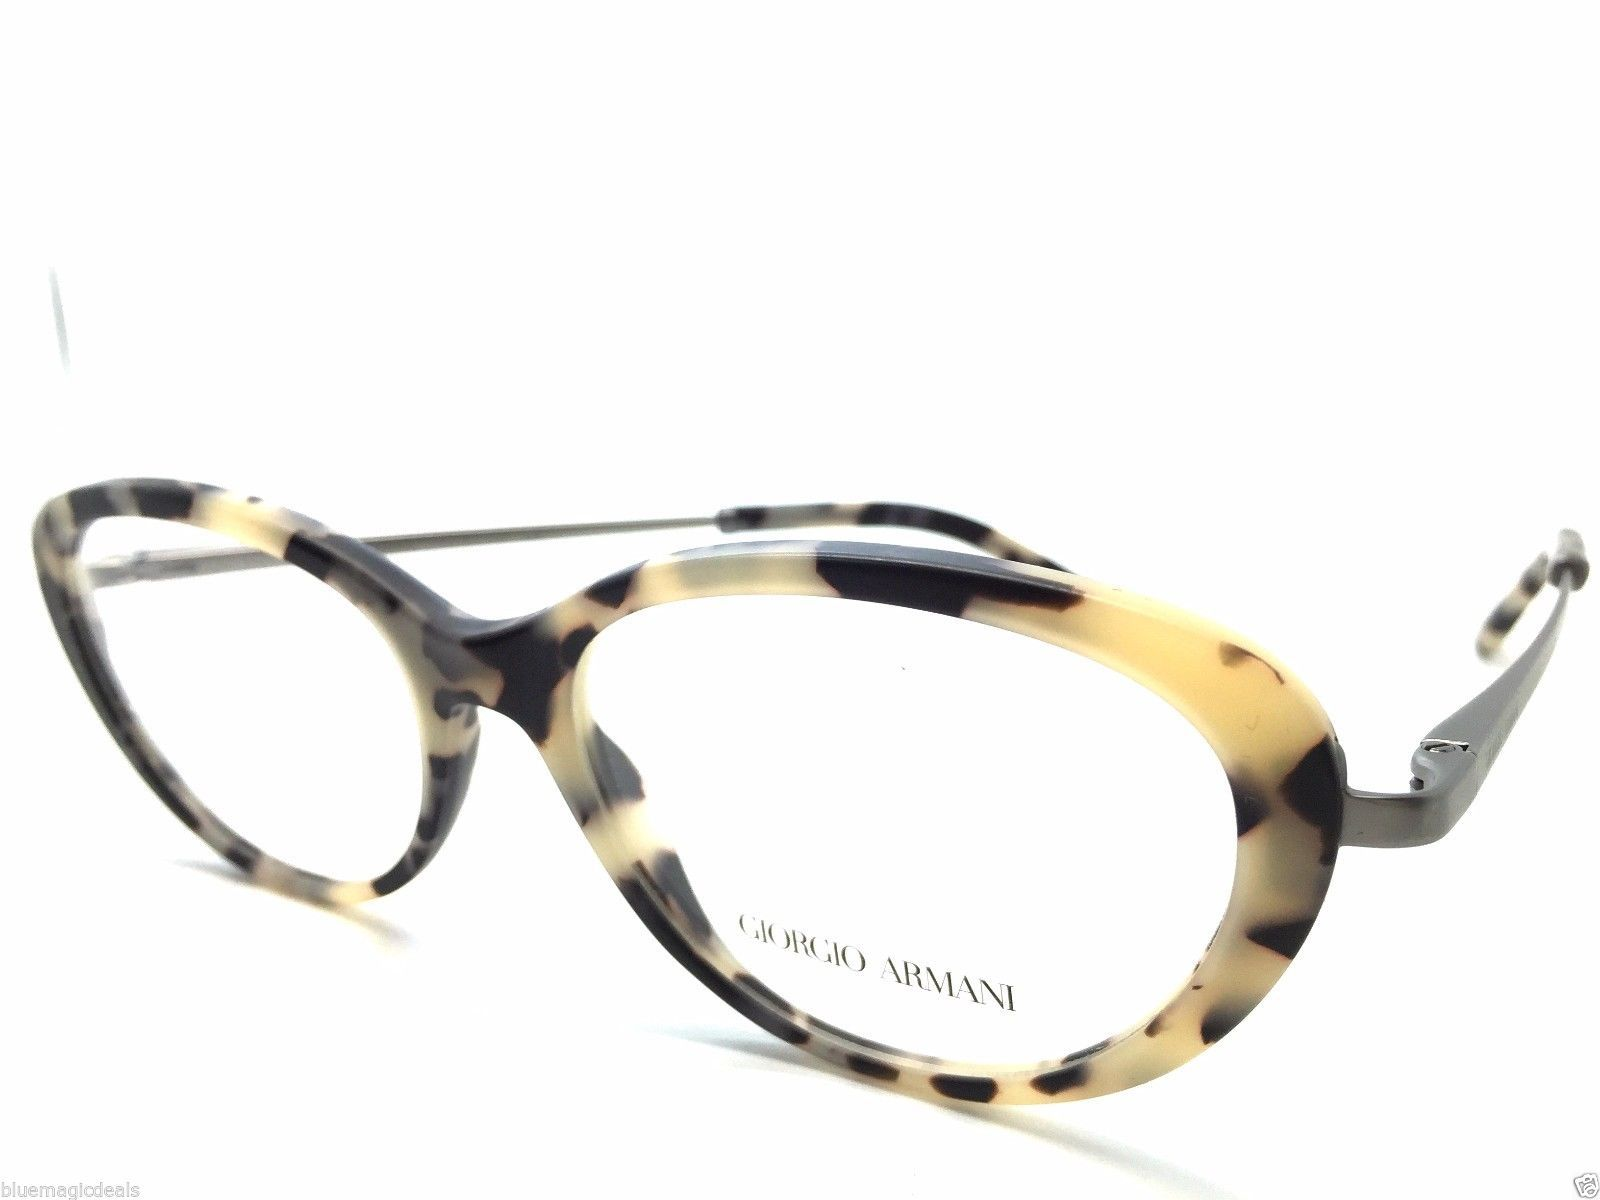 Giorgio Armani Eyeglasses Frame: 1 listing